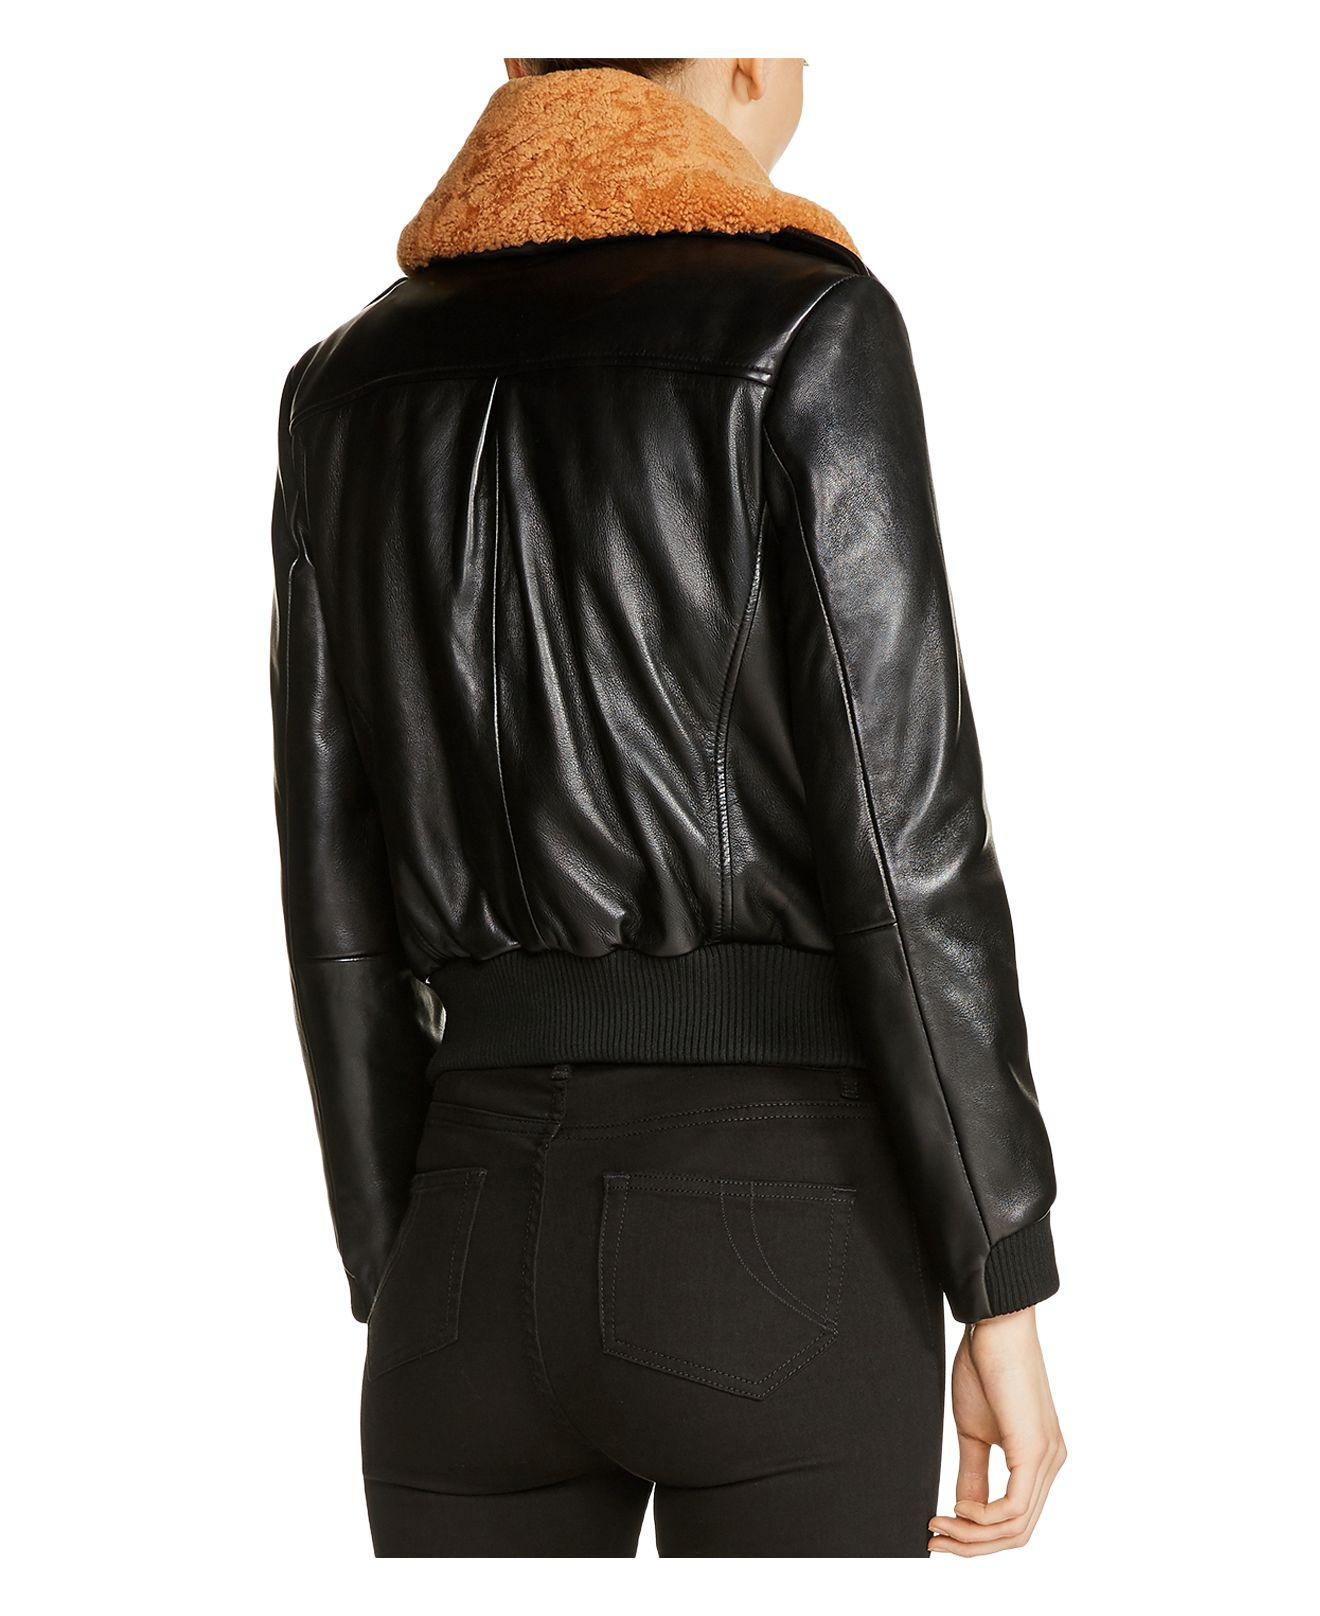 Bengals leather jacket